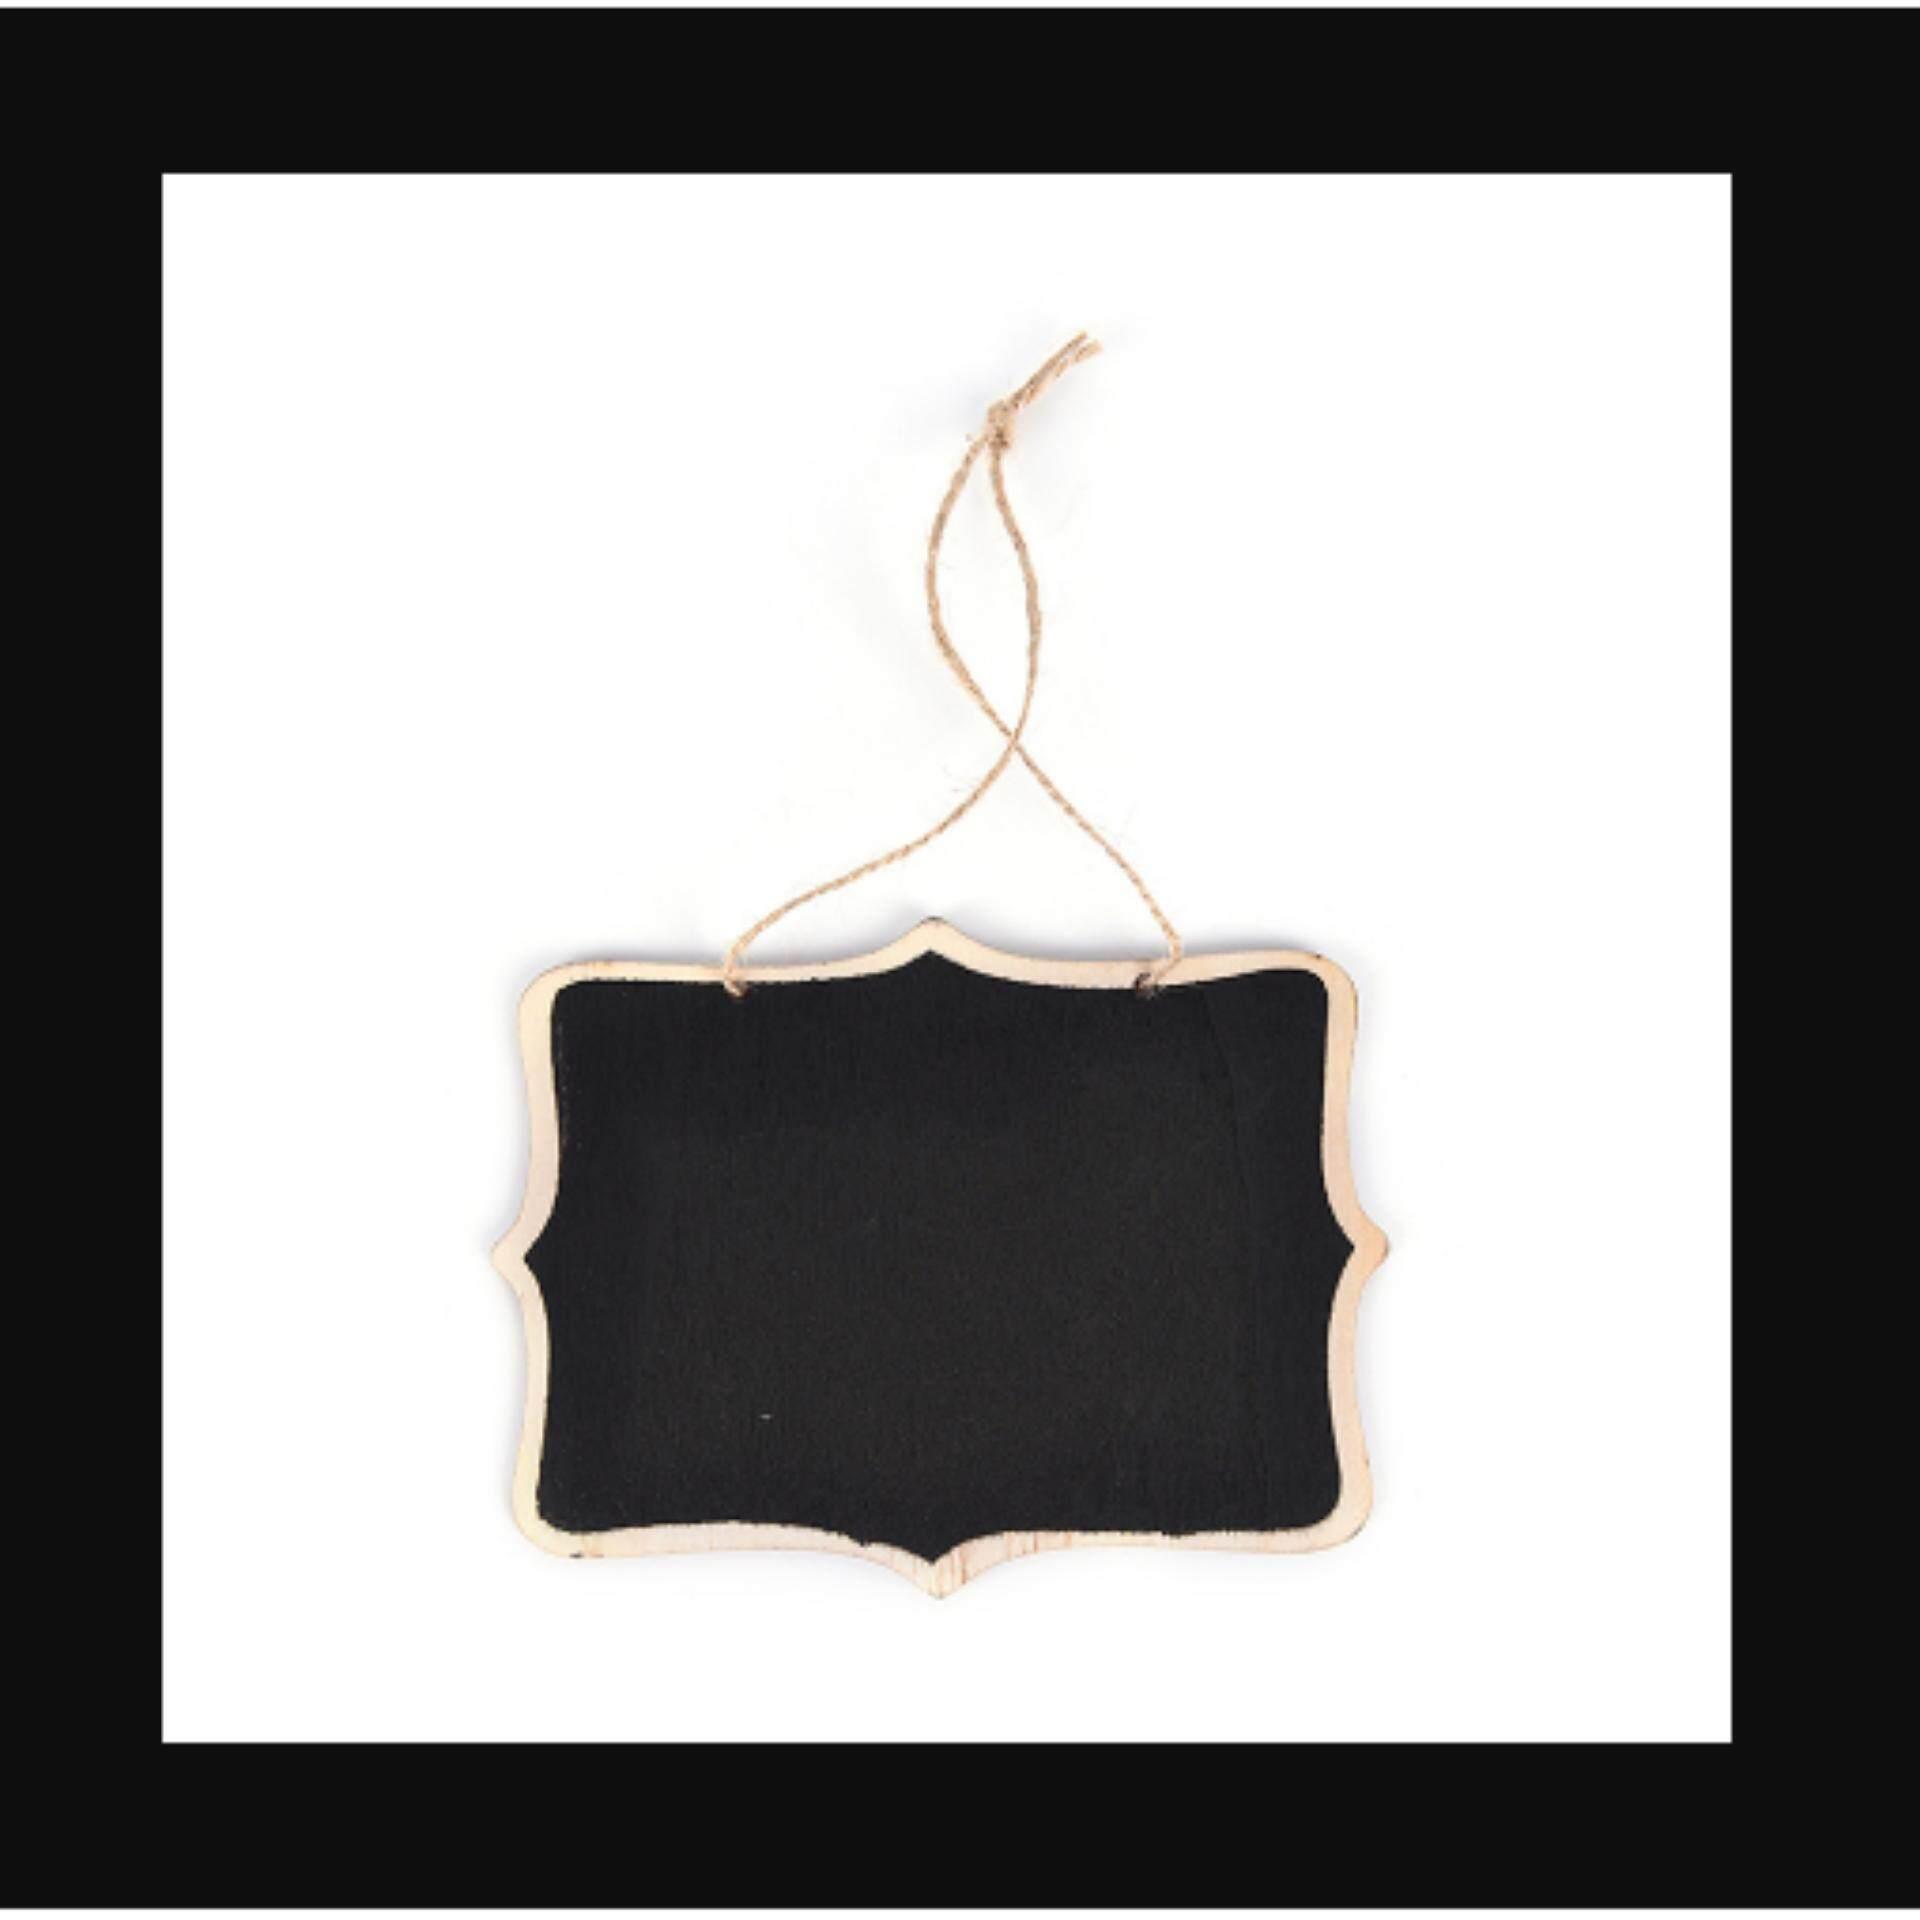 Mini Wooden Wedding Blackboard Chalkboard Hanging Message Number Party Decor - Intl By Crystal Wave.